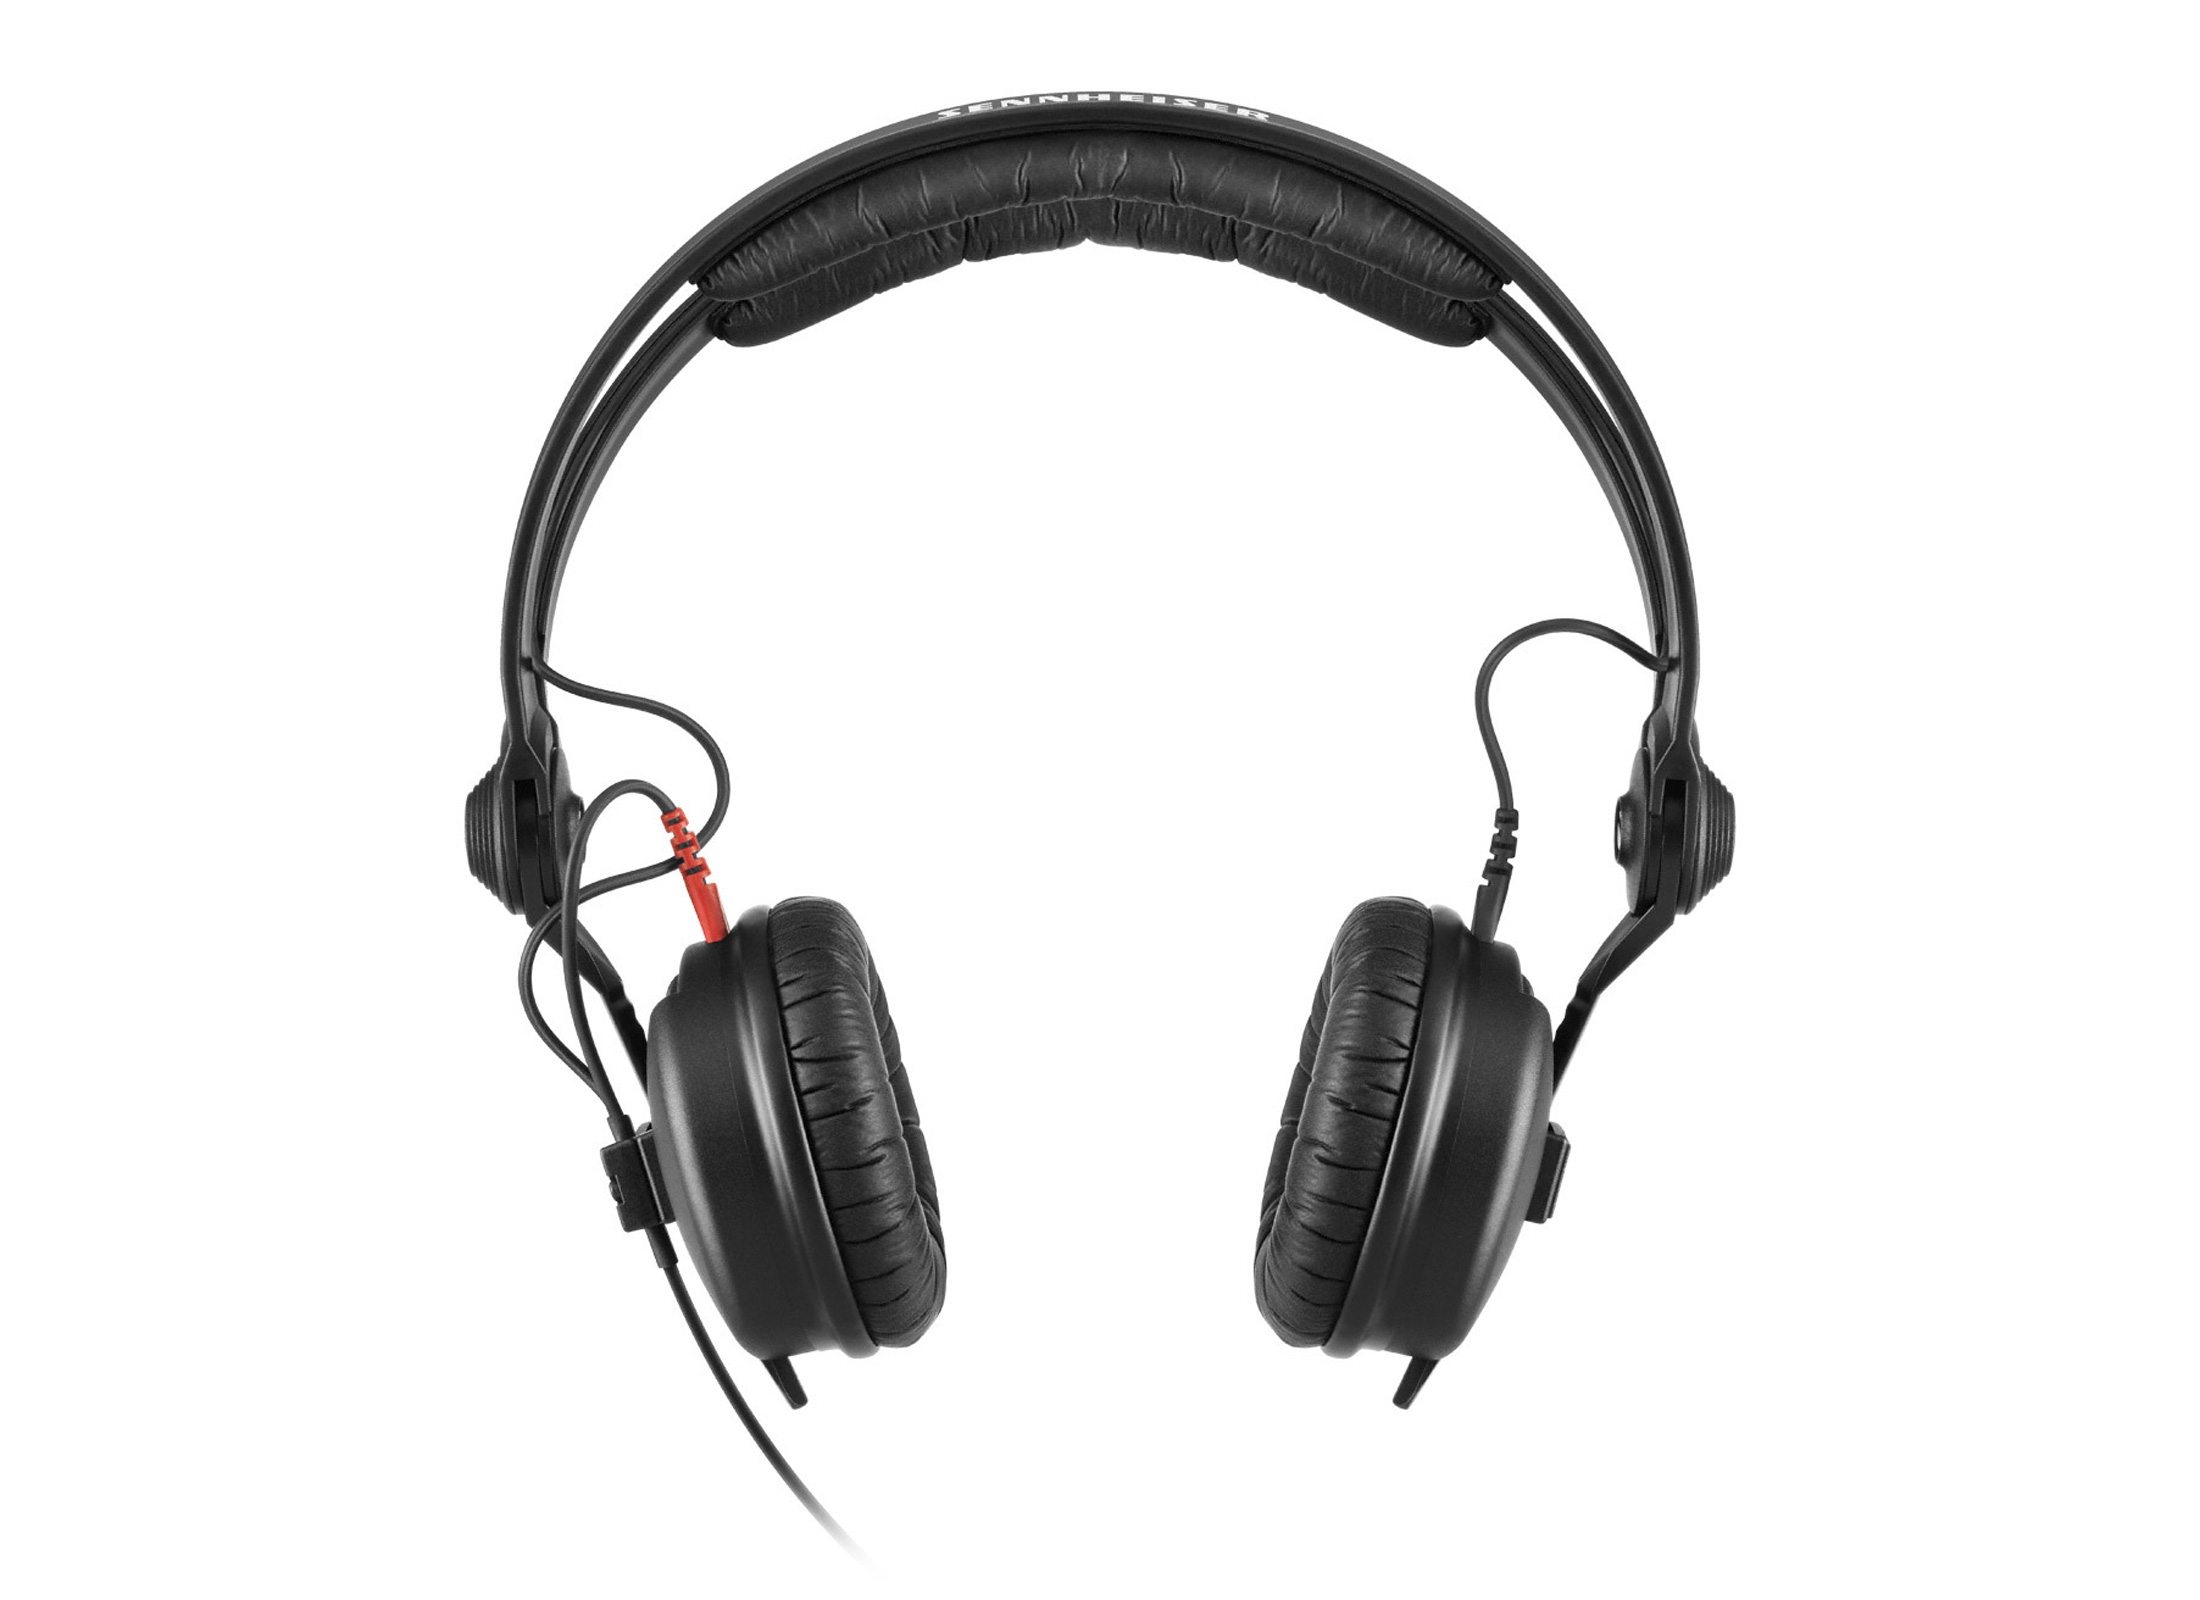 Sennheiser HD 25 Online At Low Prices At Huss Light & Sound